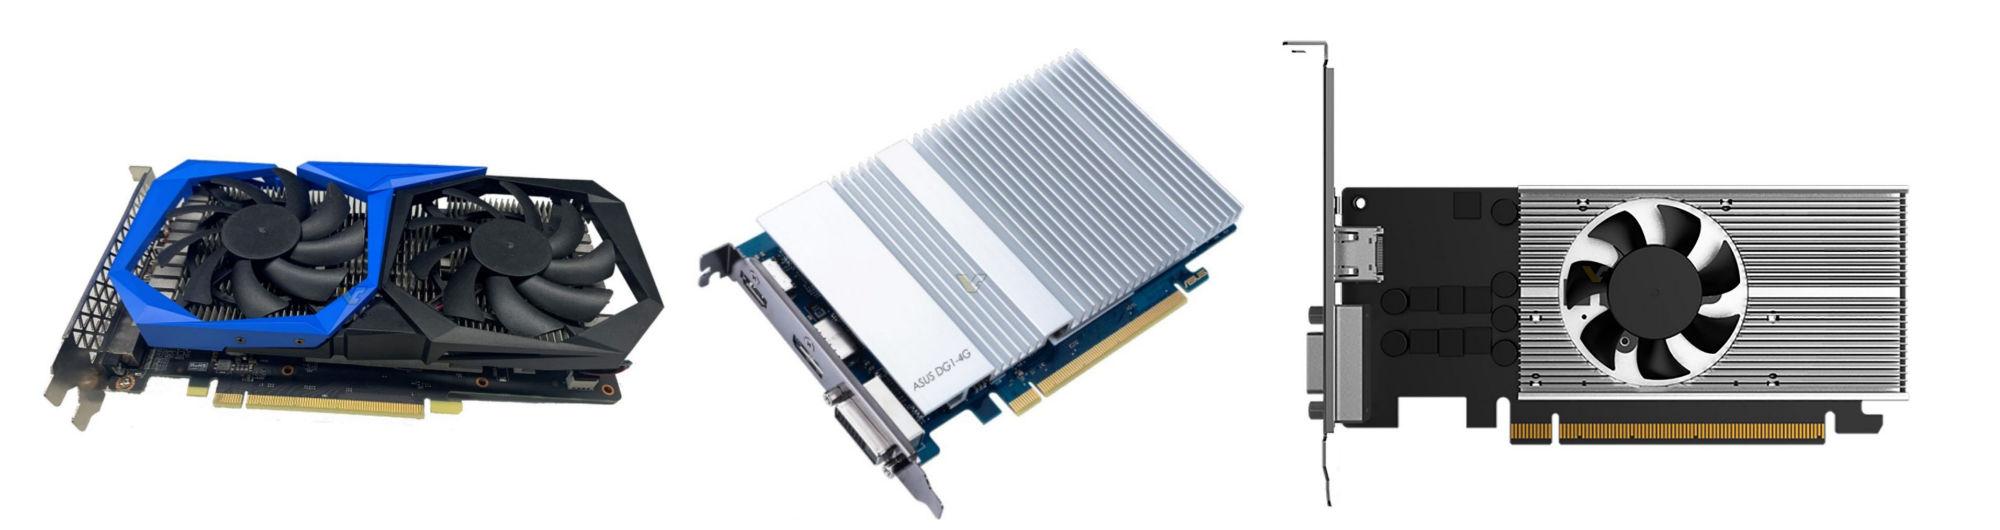 intel iris xe discrete custom ลือ!! เผยข้อมูล 3 บริษัทยักษ์ใหญ่ ASUS, Gigabyte และ MSI พร้อมเป็นพาร์ทเนอร์การ์ดจอ Intel Arc Alchemist รุ่นใหม่ล่าสุดที่กำลังจะเปิดตัวในเร็วๆ นี้